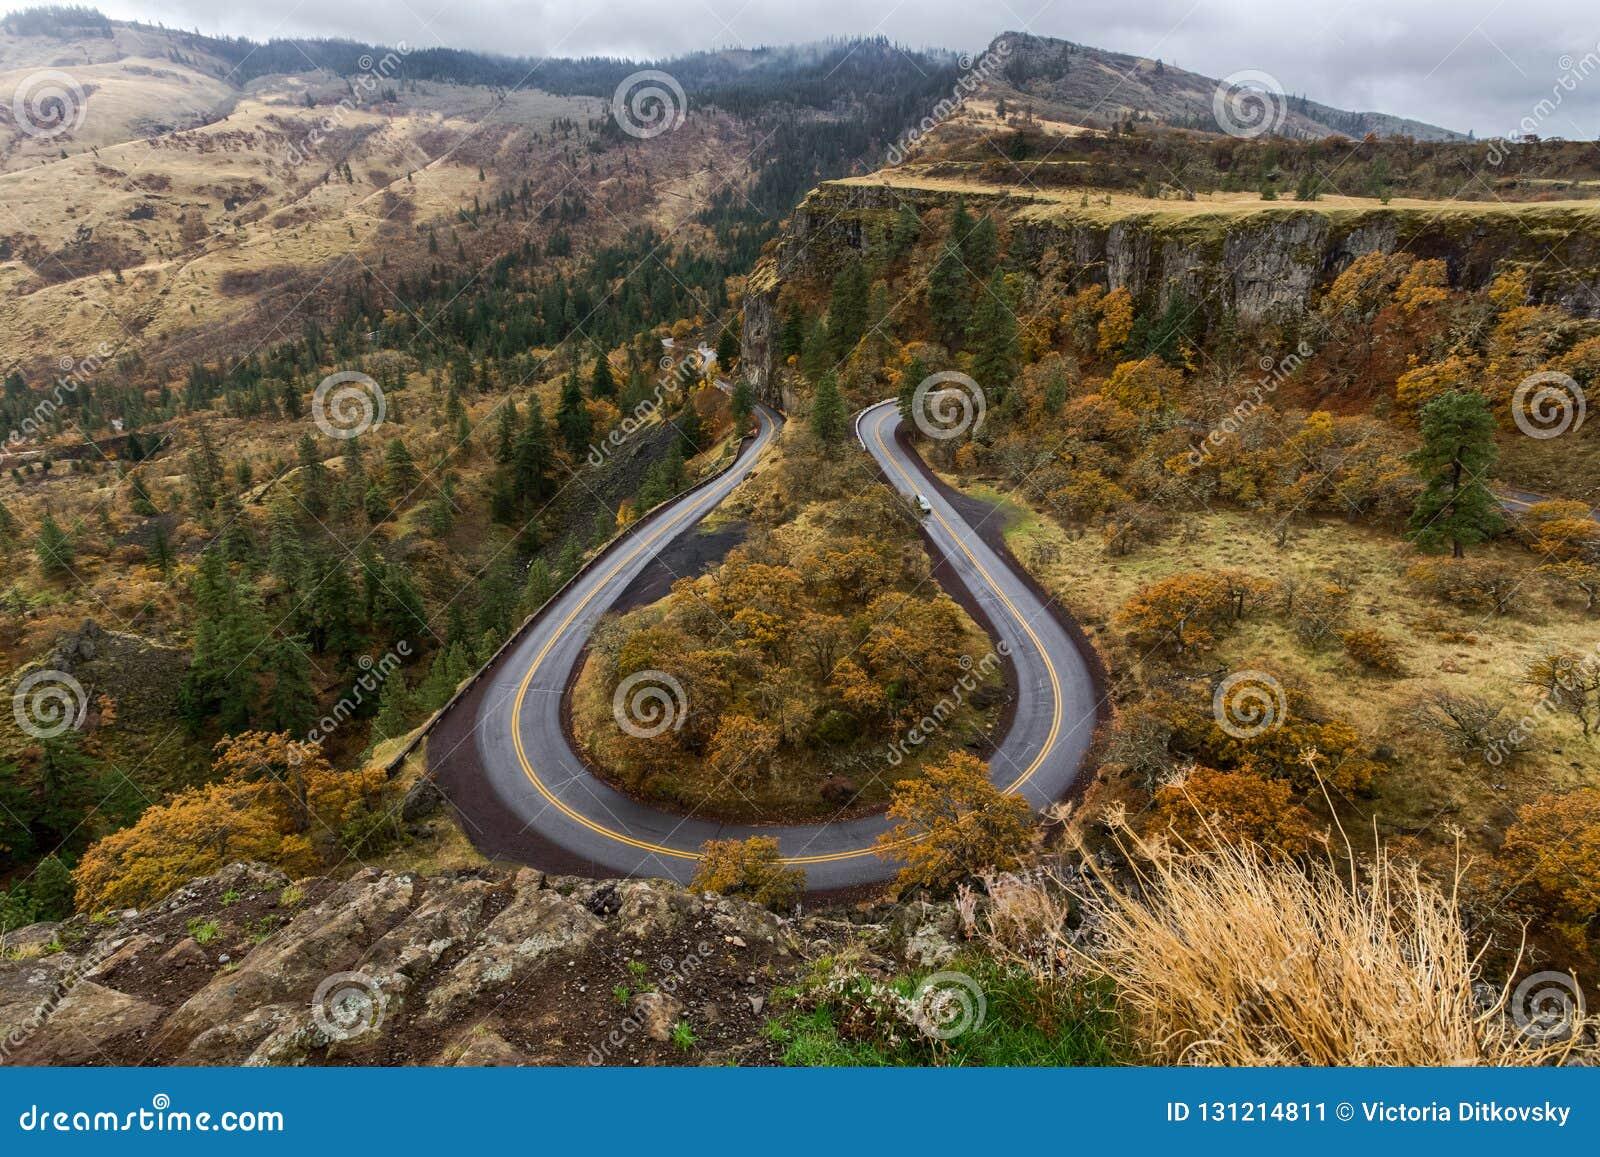 Hoefijzerweg in Rowena Crest, Oregon